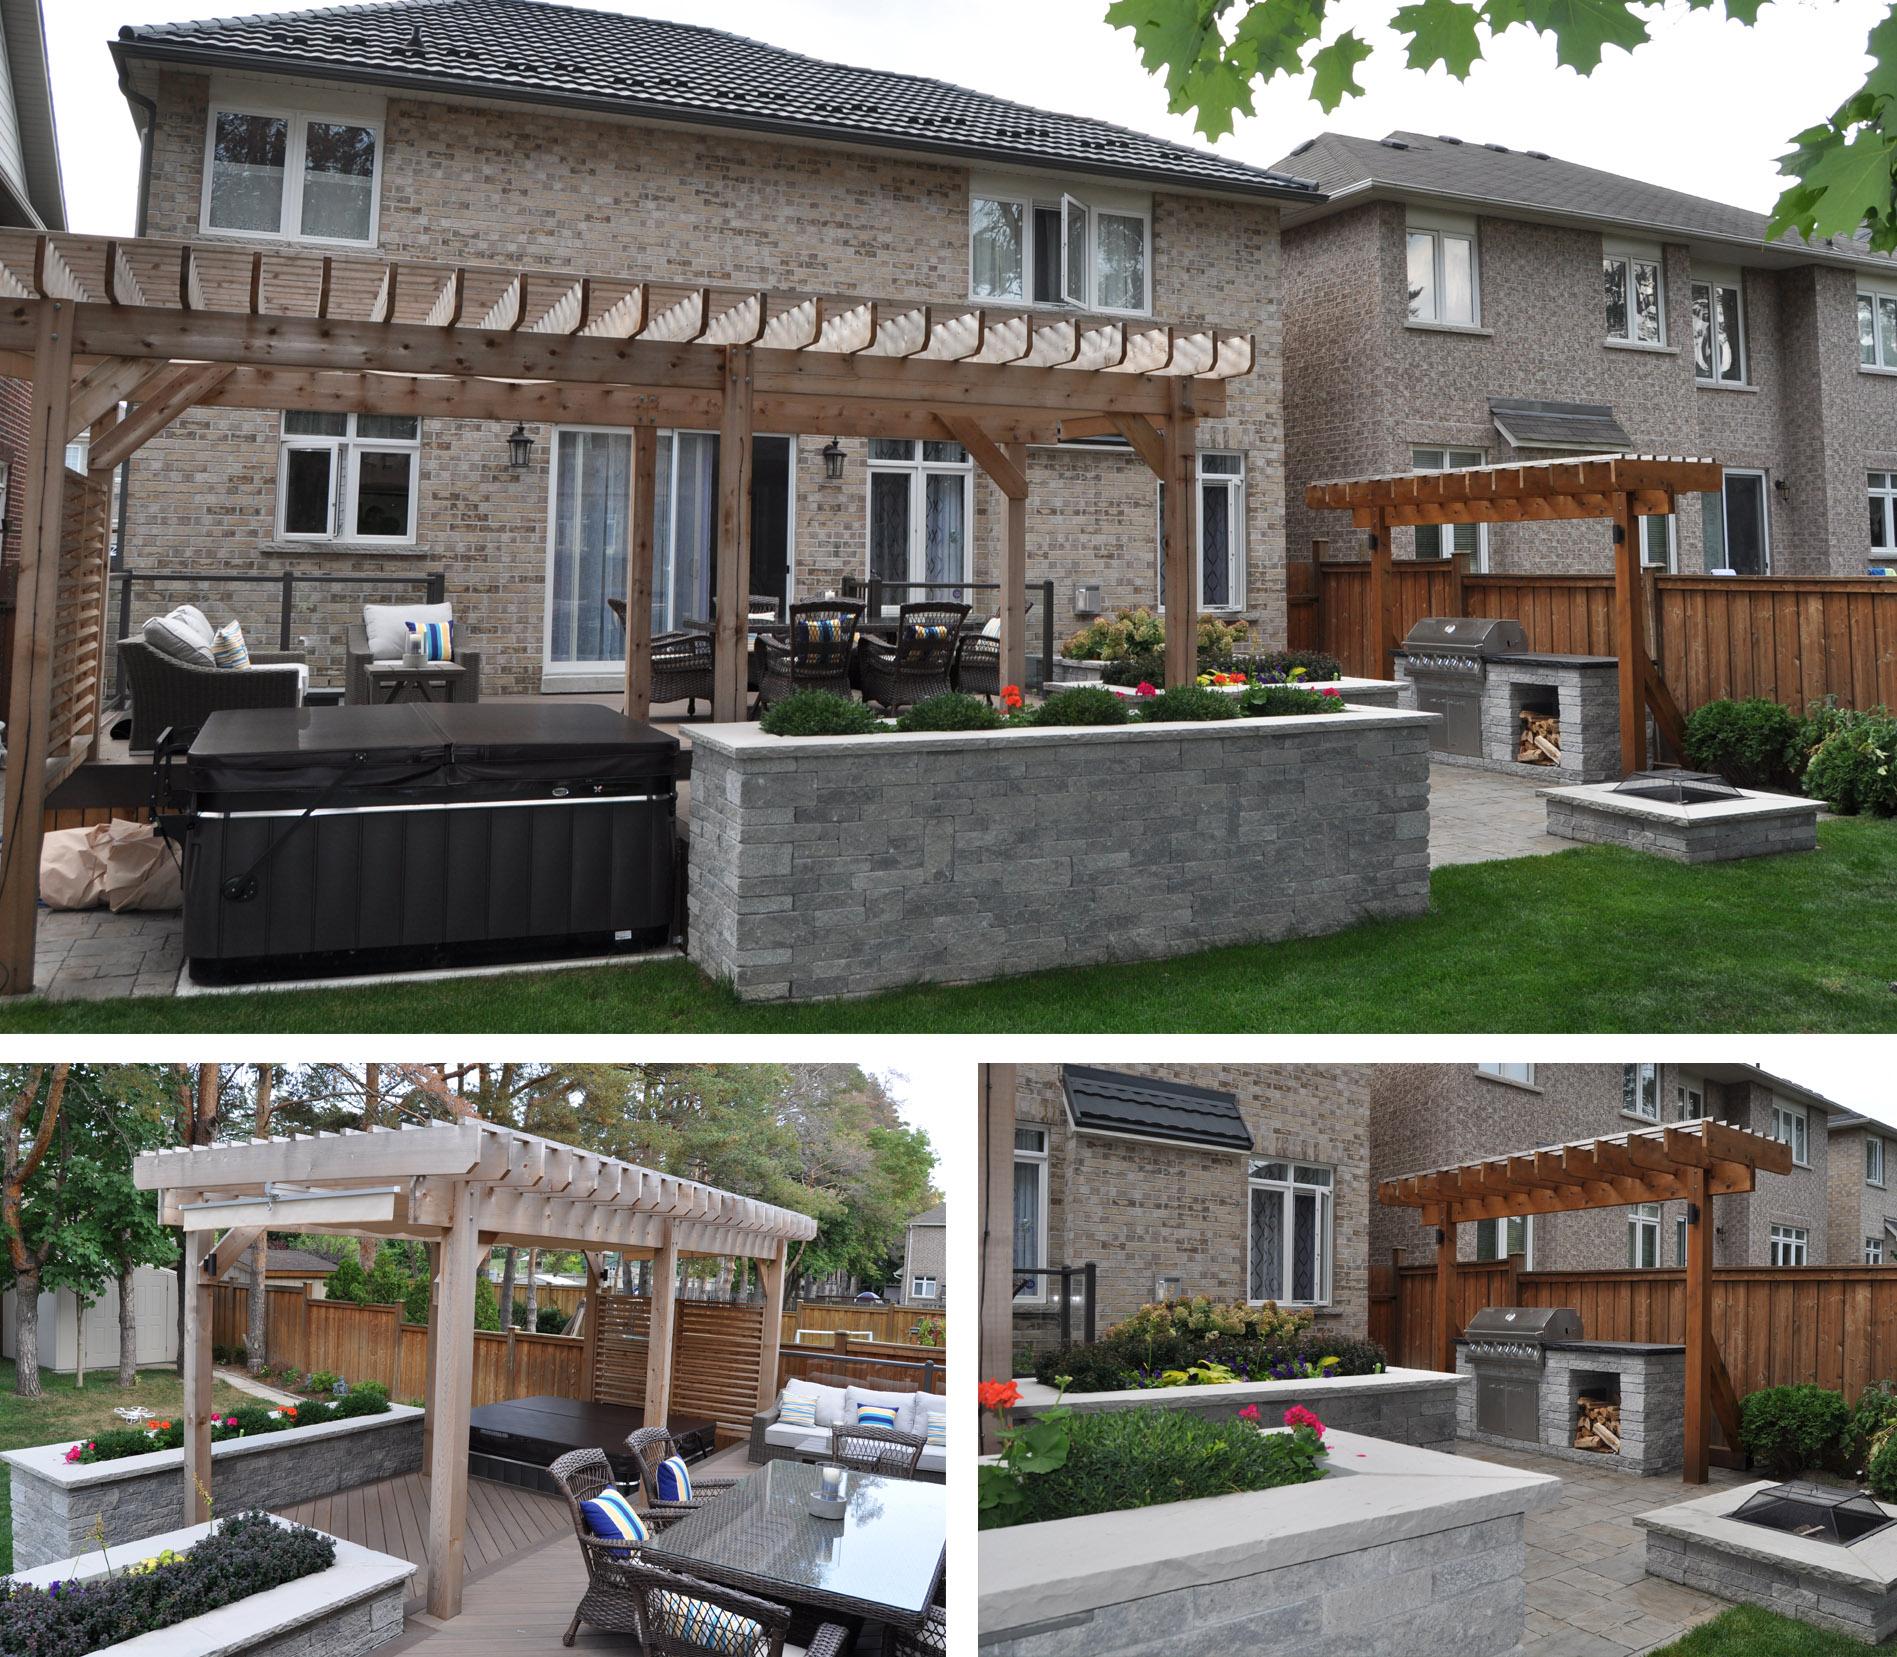 Brick homes with backyard pergolas.